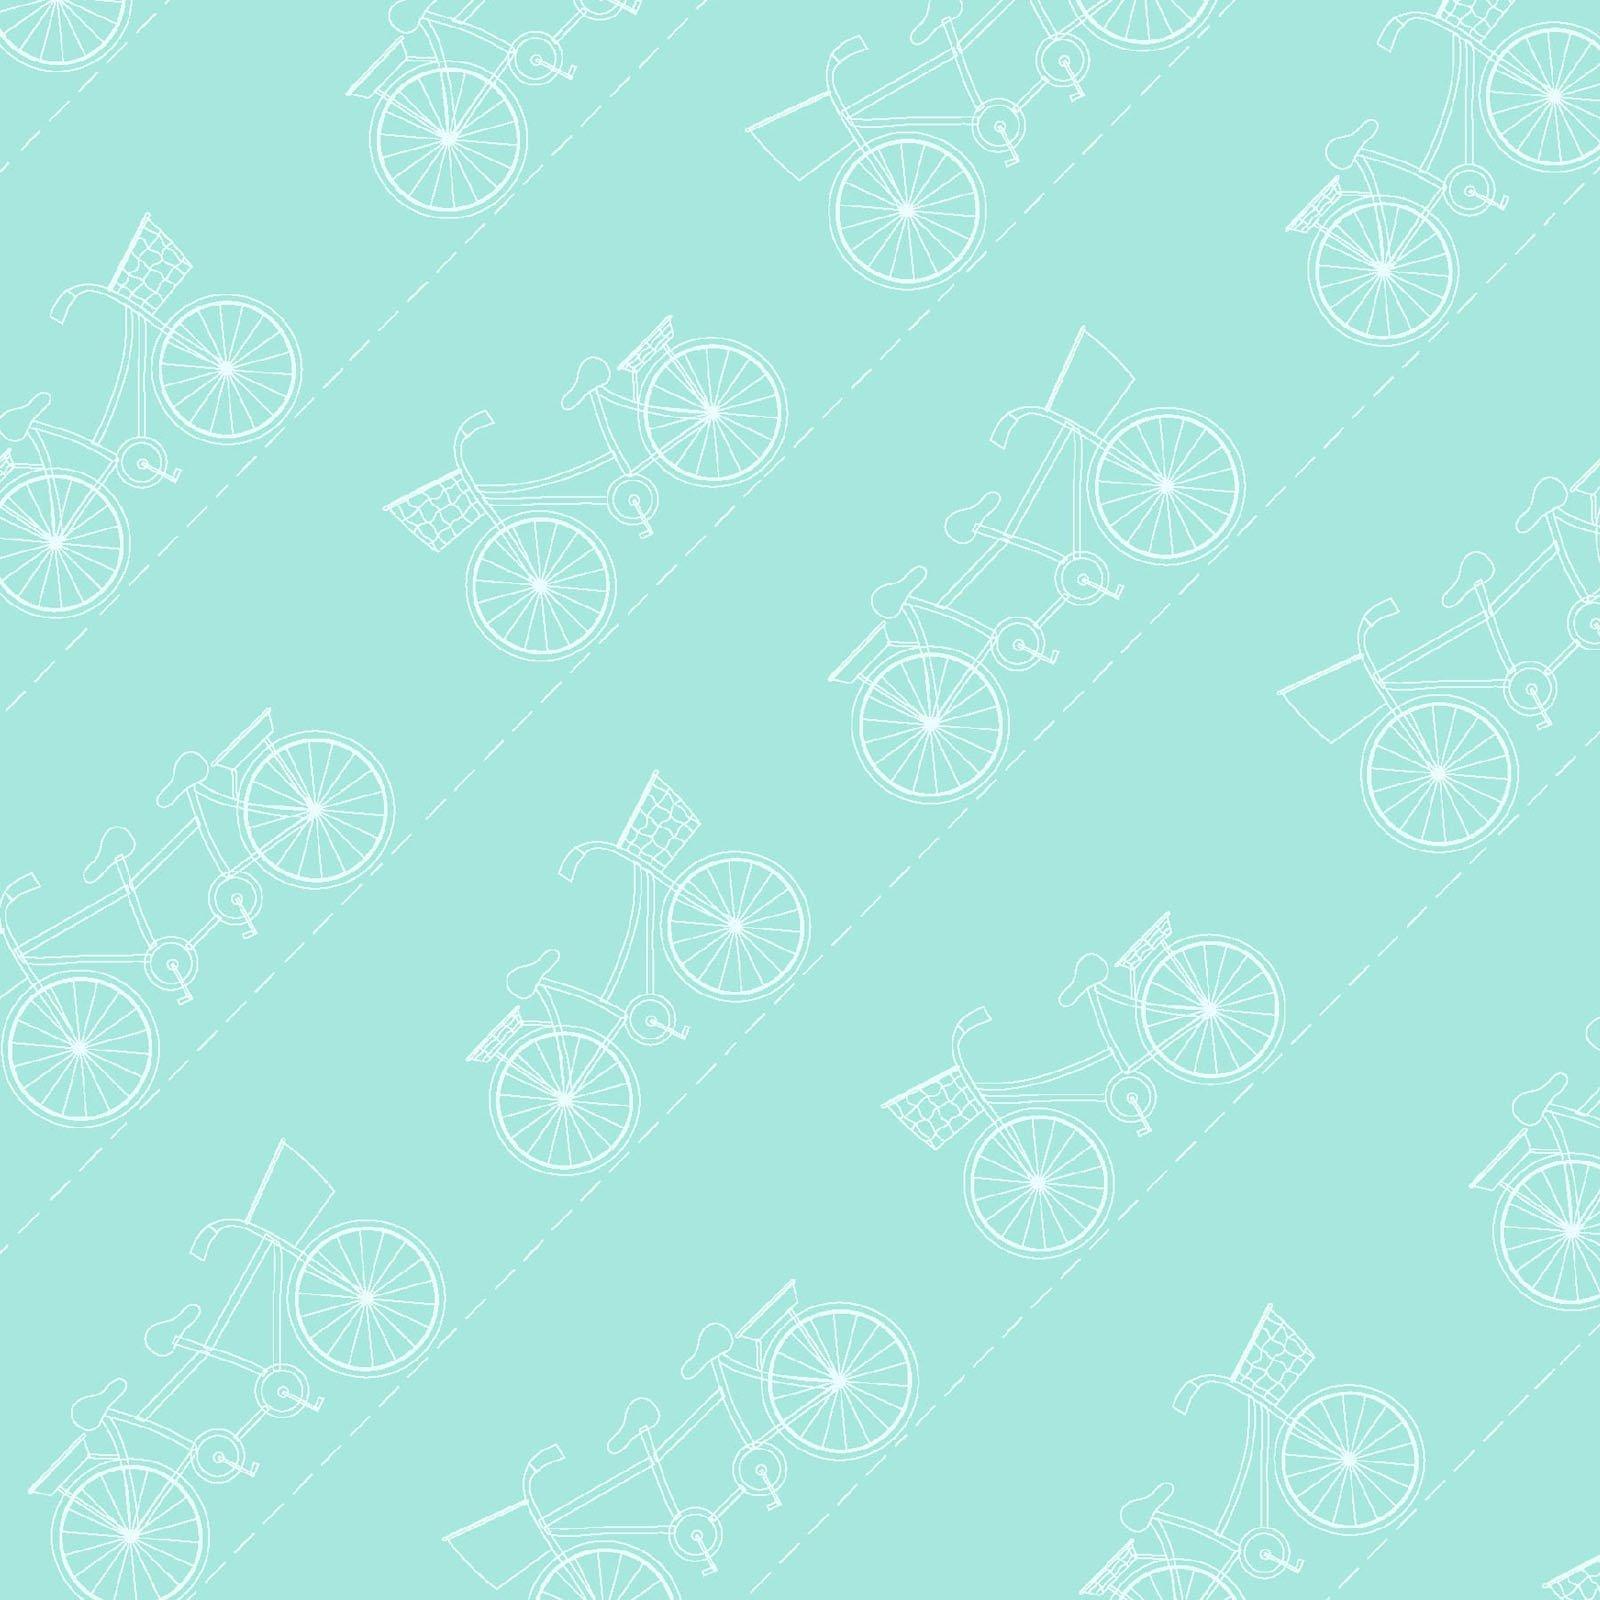 Teal Diagonal Bikes